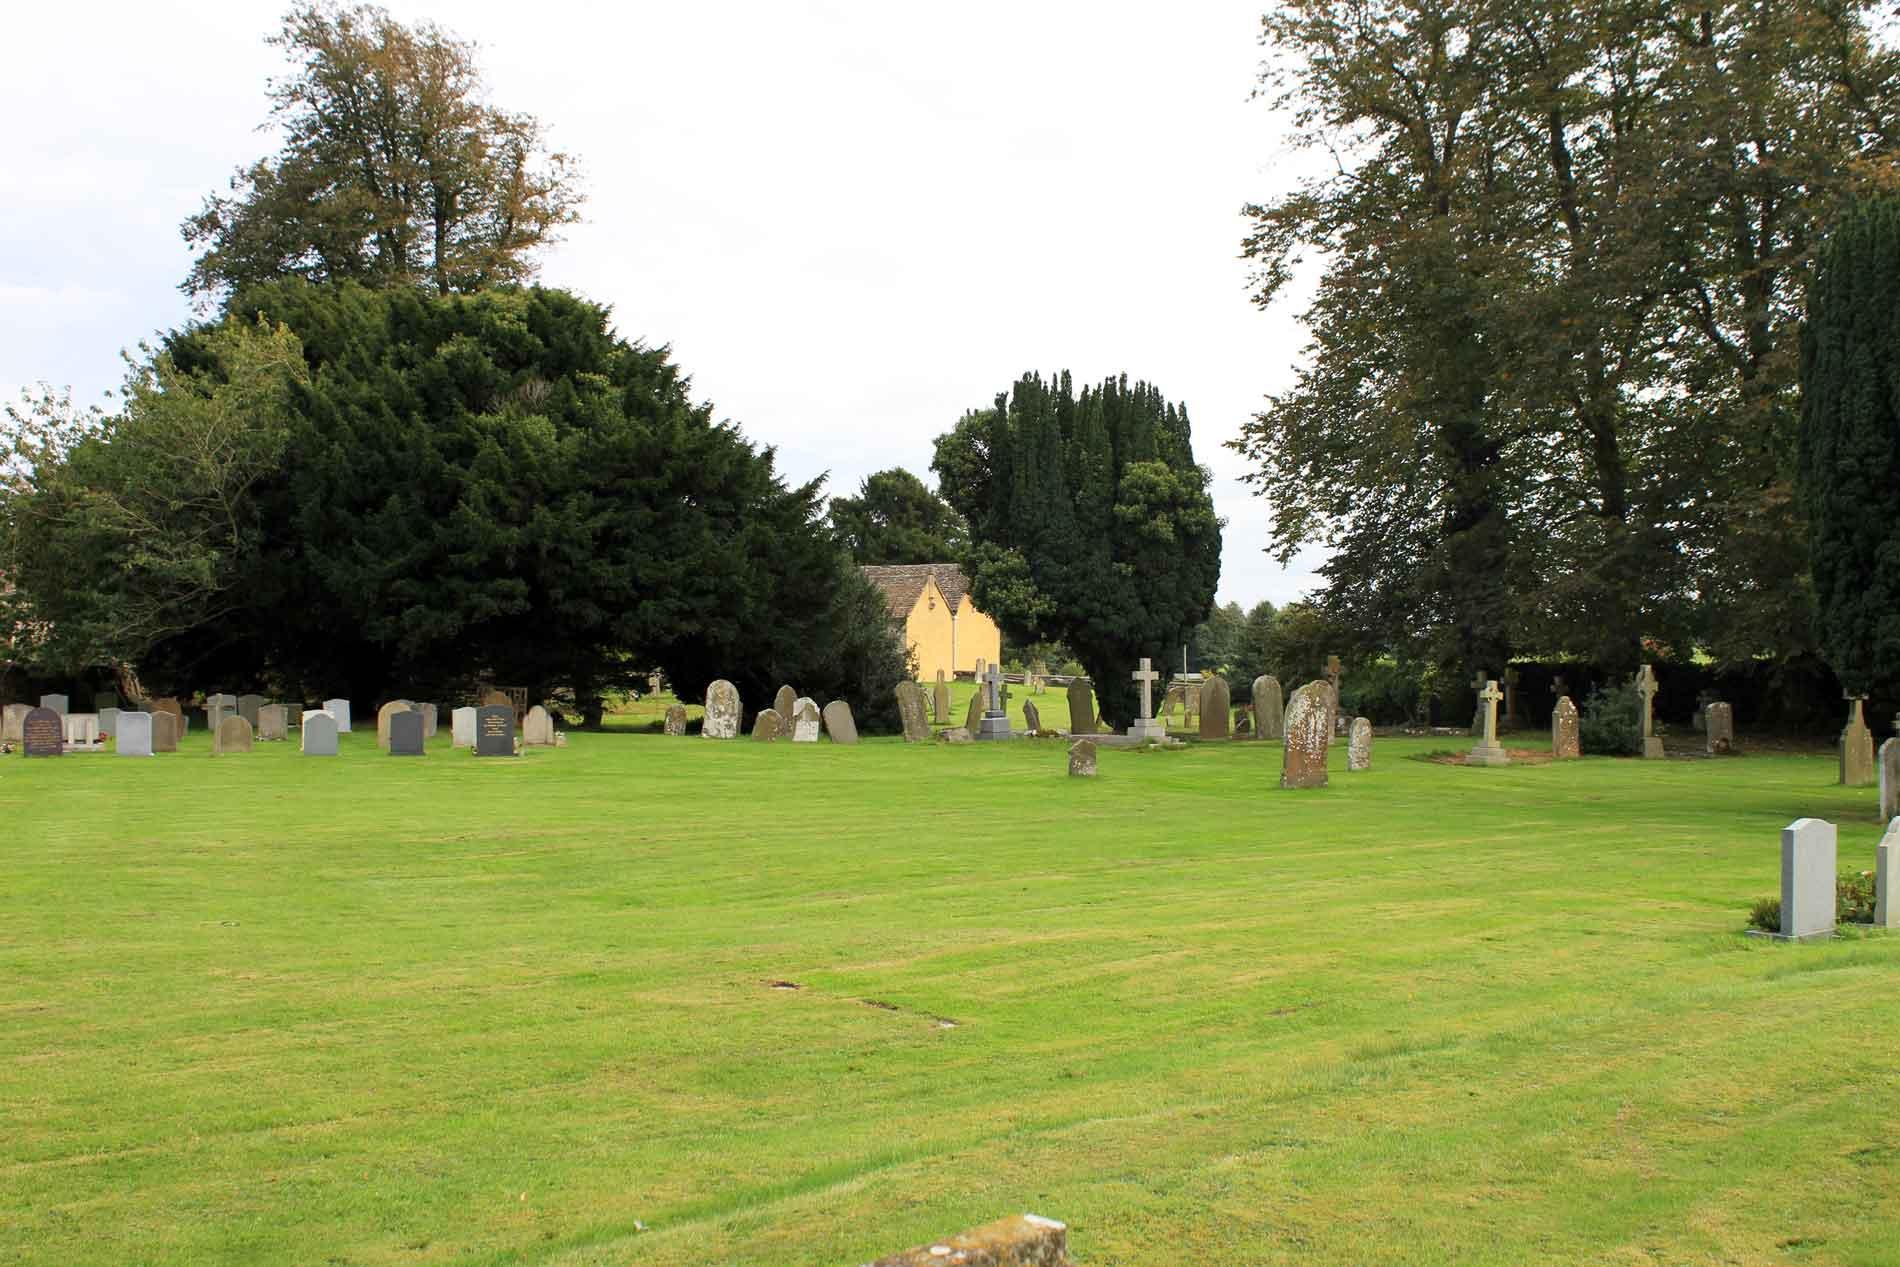 The Churchyard at Little Badminton